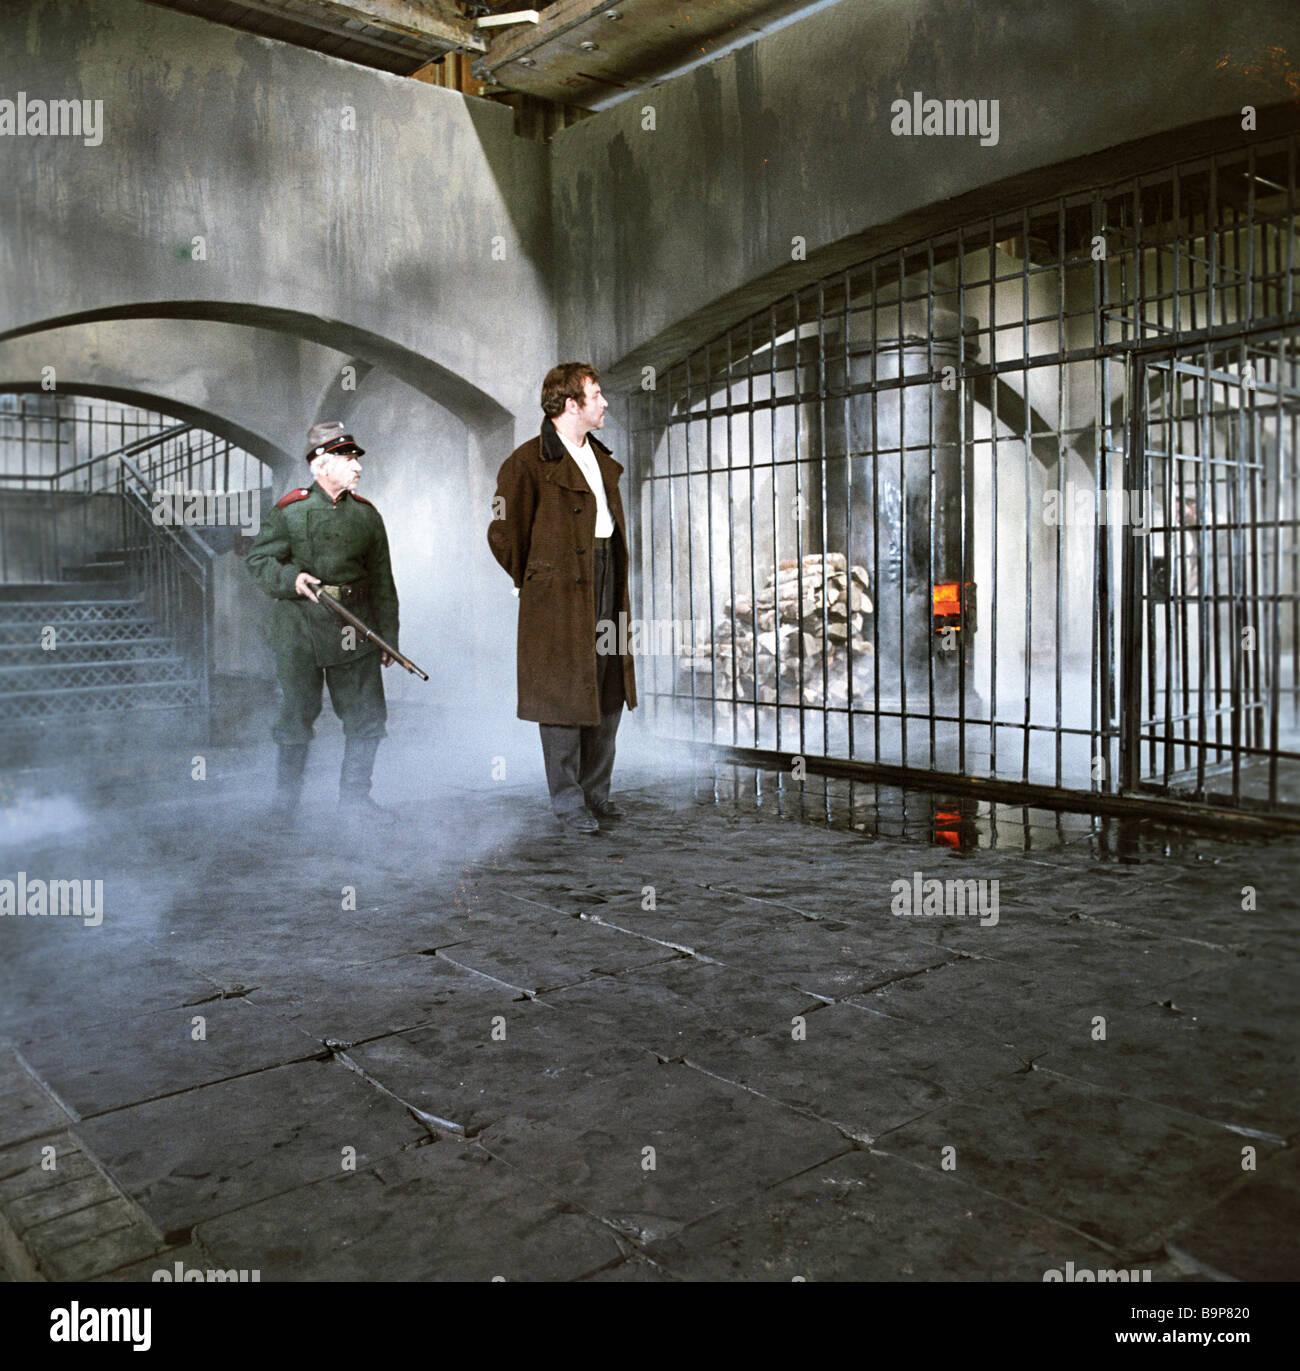 Mikhail Ulyanov center as Mitya Karamazov in the film The Brothers Karamazov - Stock Image